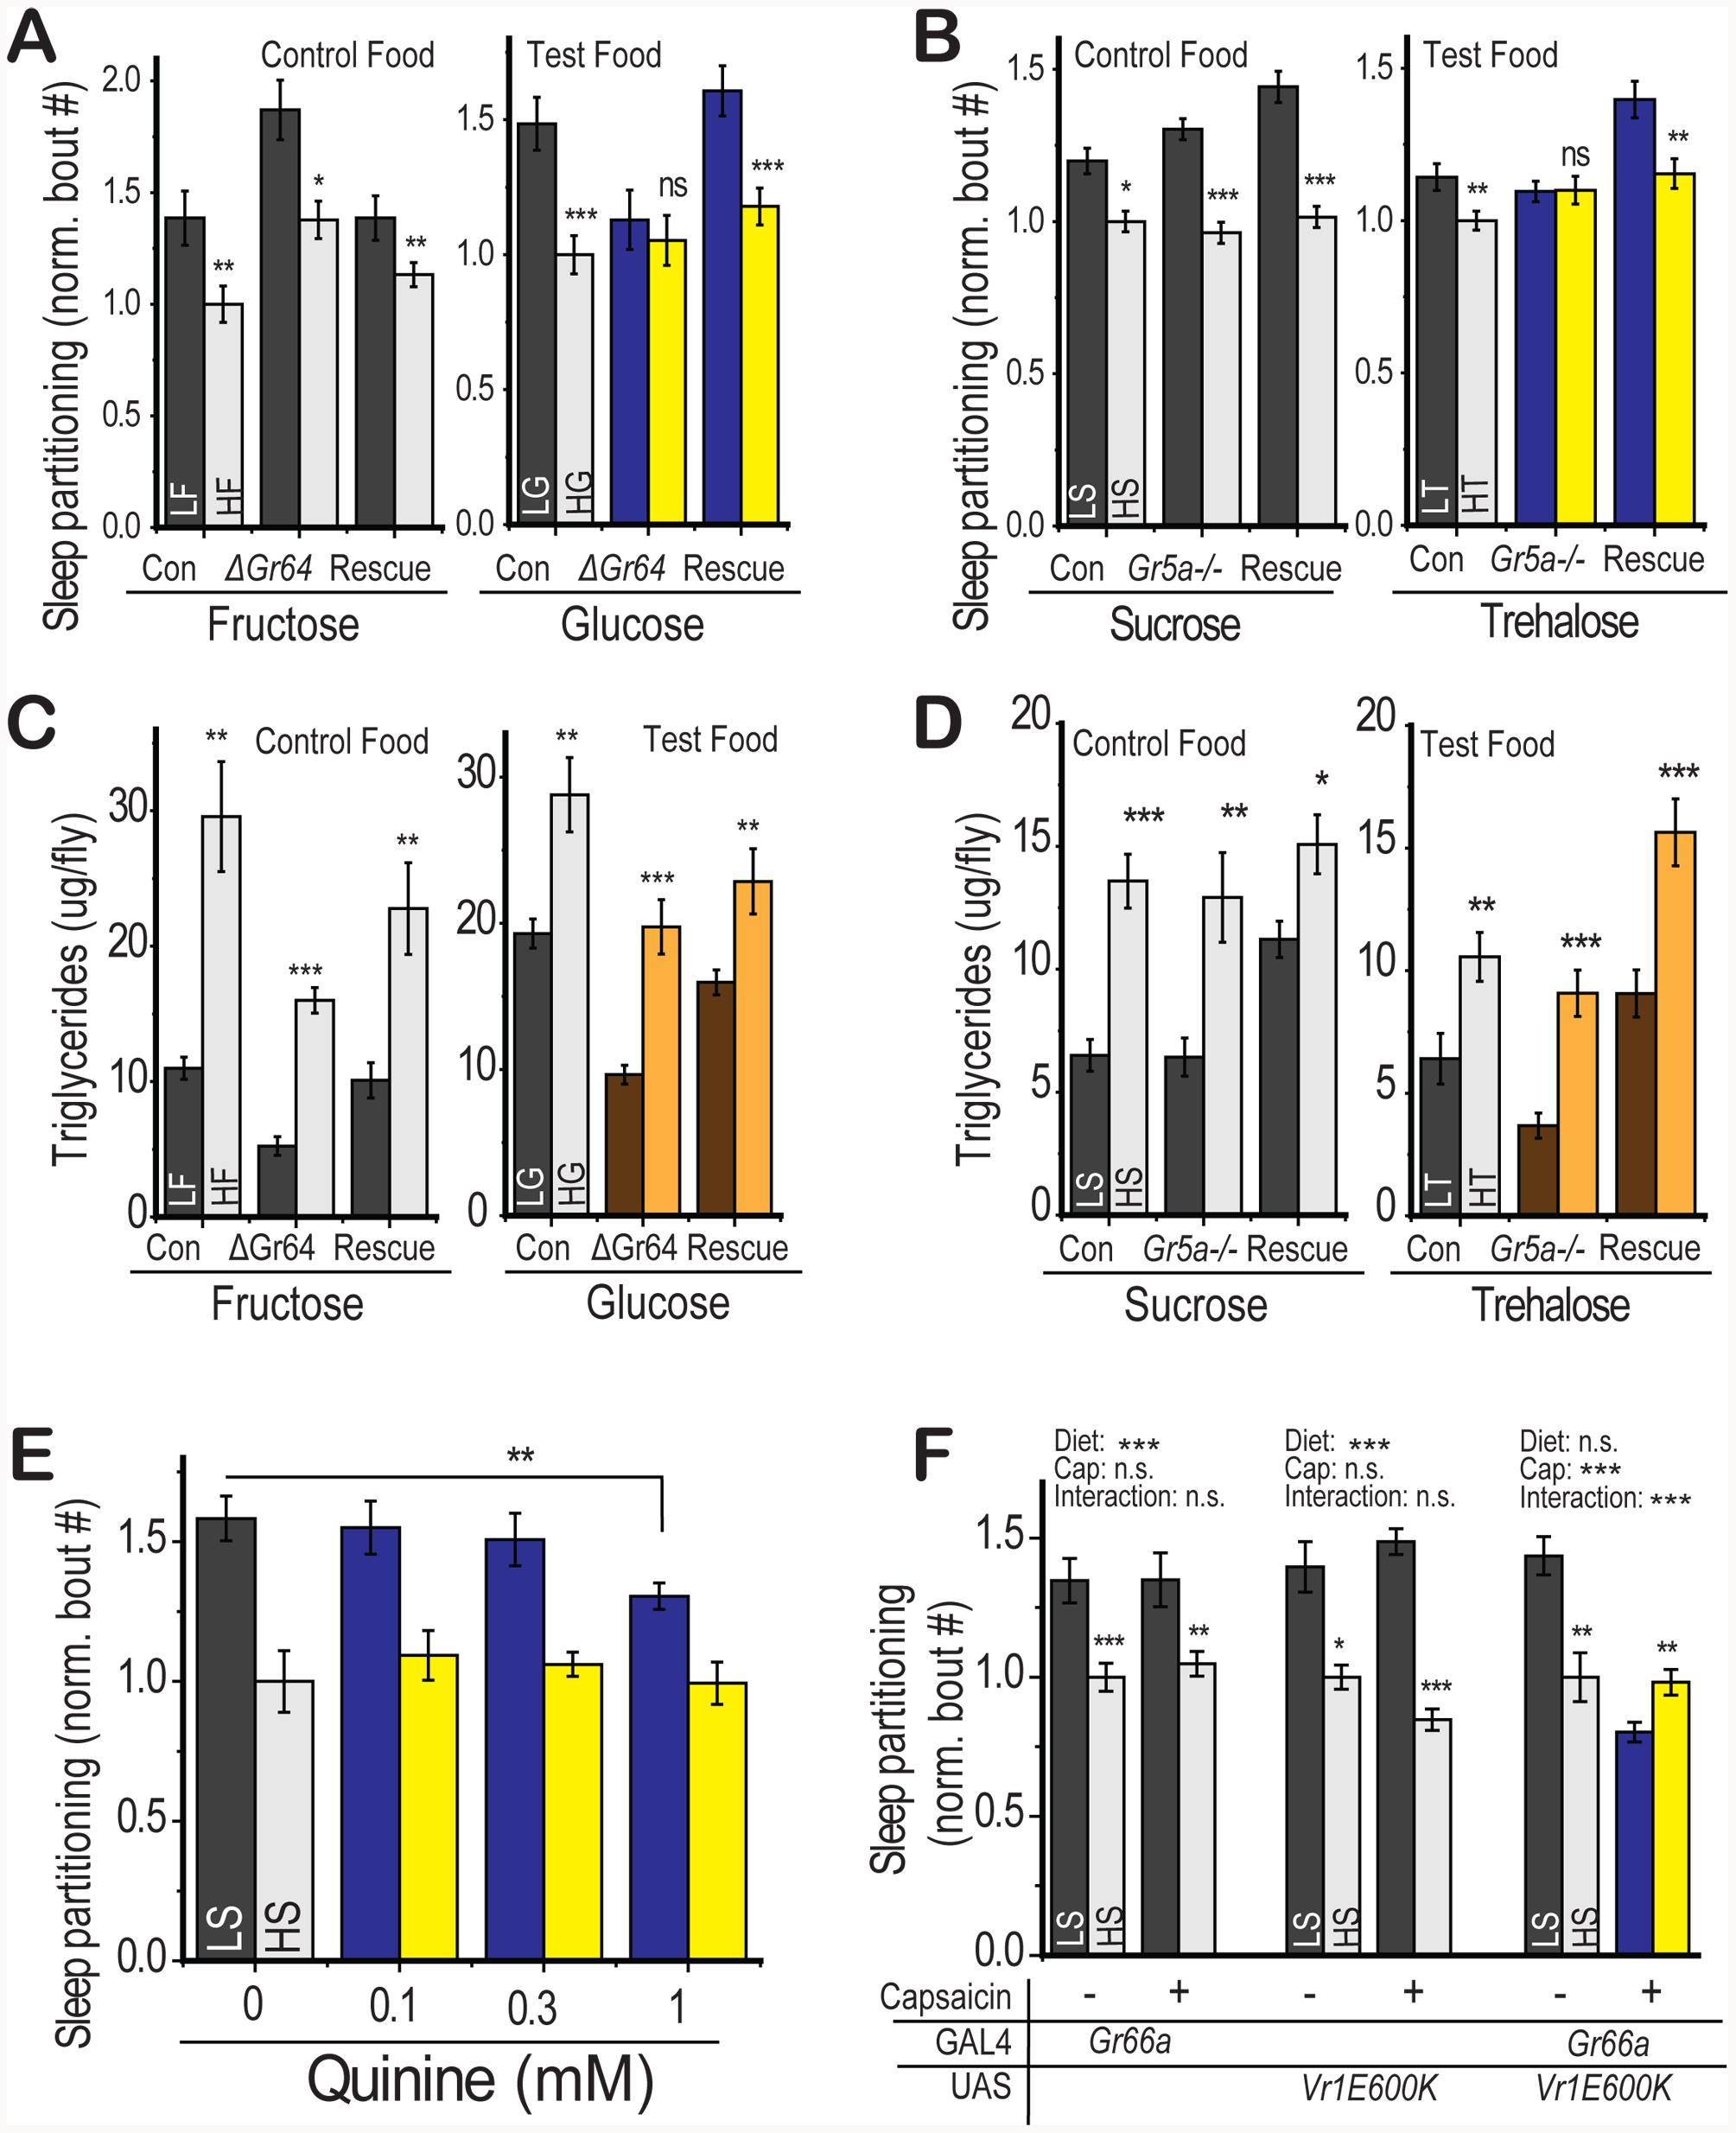 Gustatory inputs mediate sleep partitioning in response to dietary sugar.